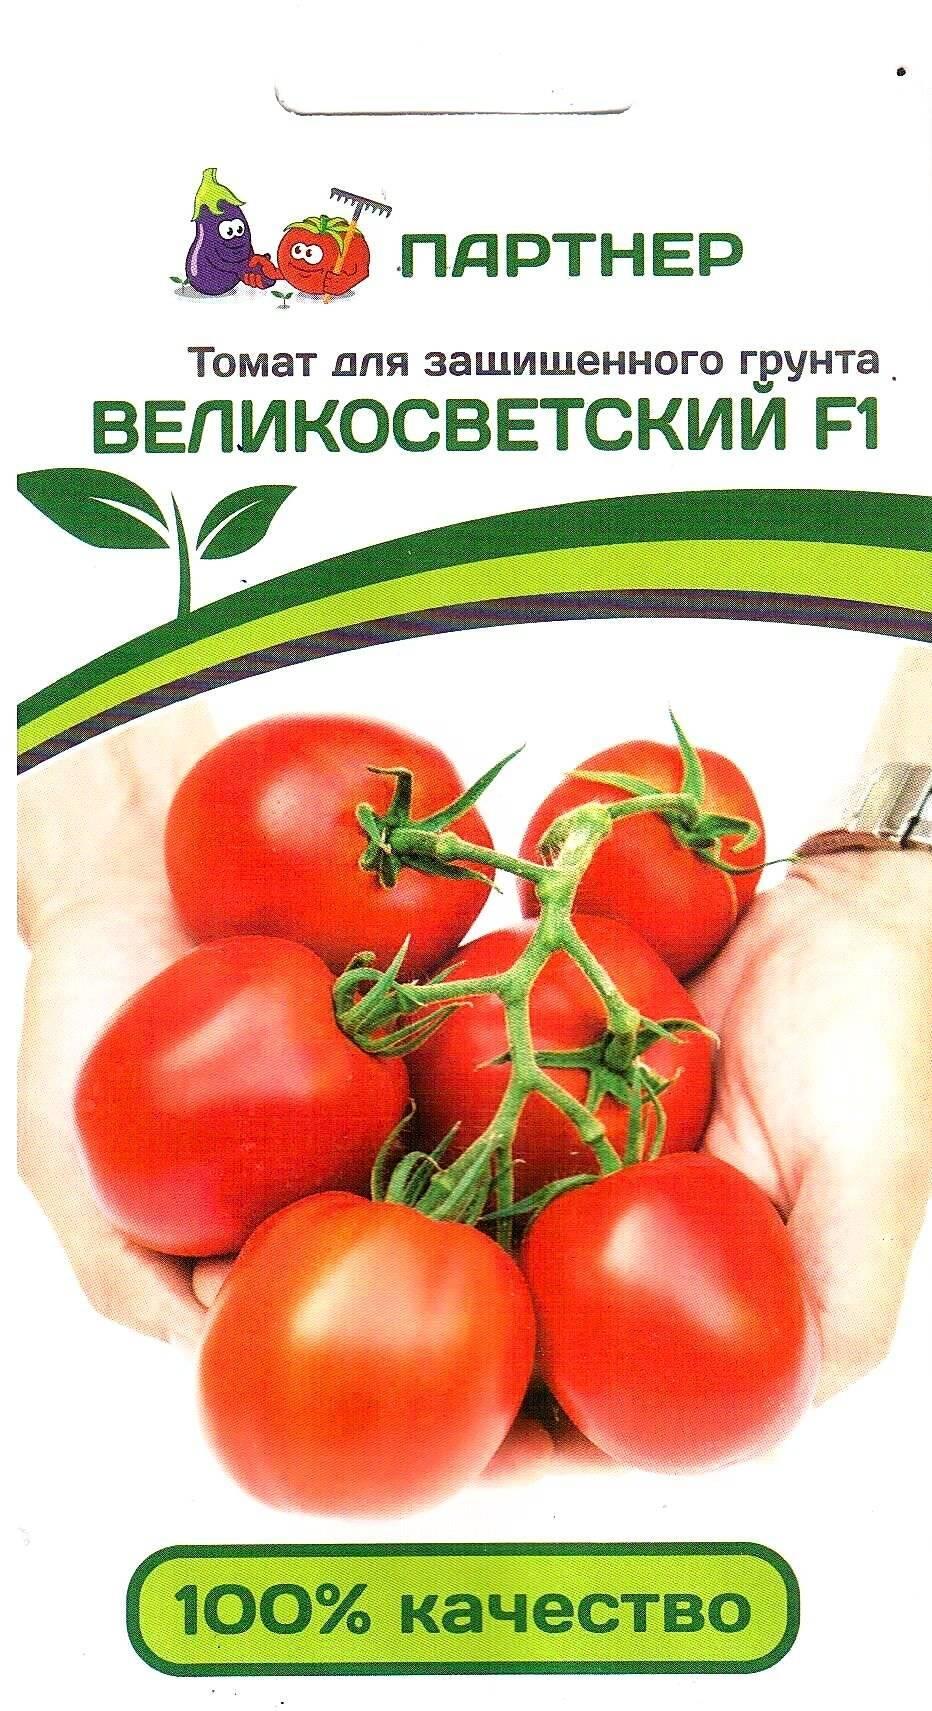 Томат кемеровец: описание сорта, отзывы, фото, характеристика | tomatland.ru